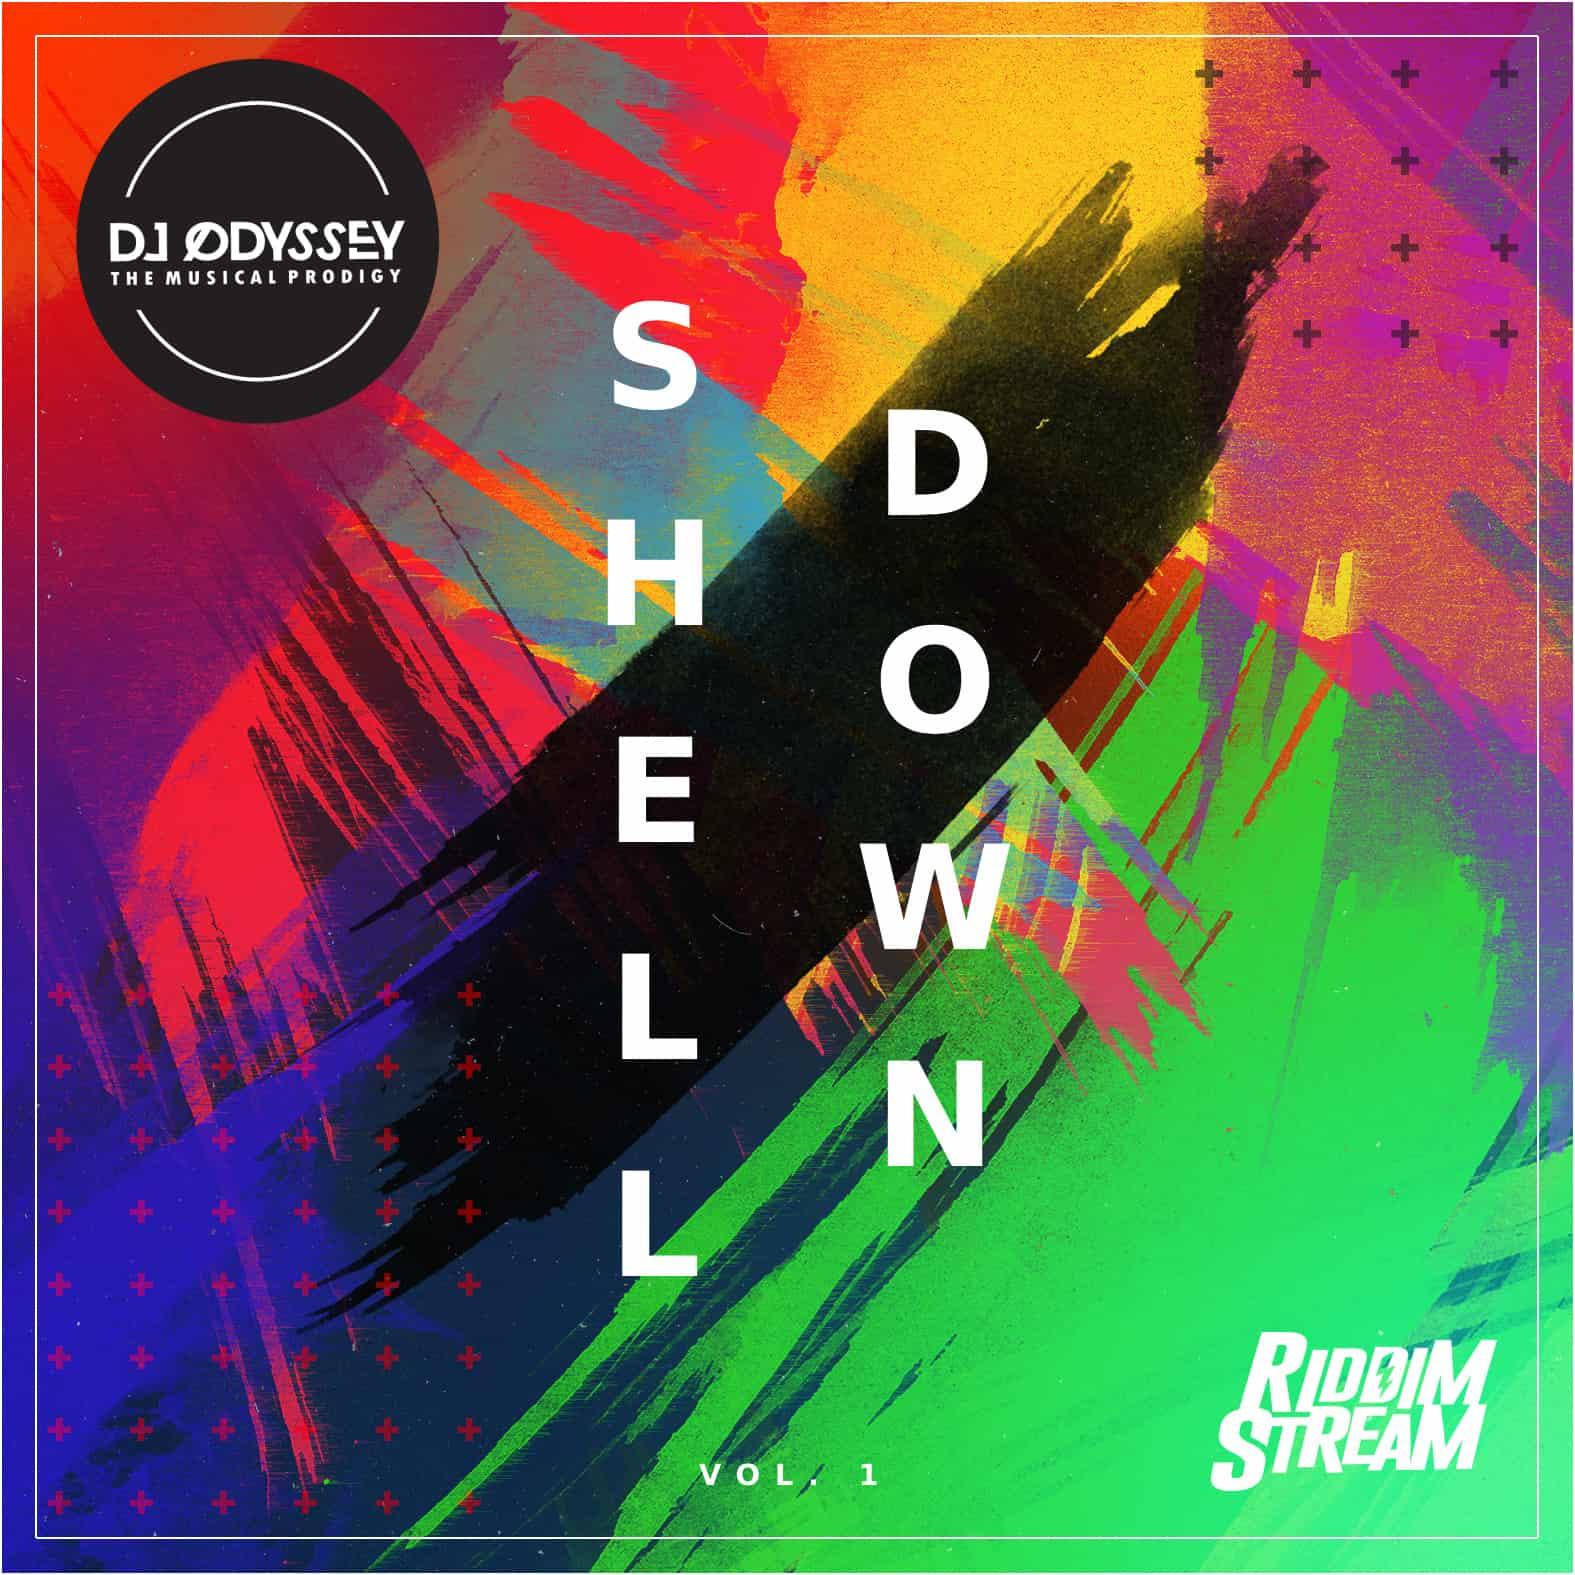 Dj Odyssey - Shell Down Vol. 1